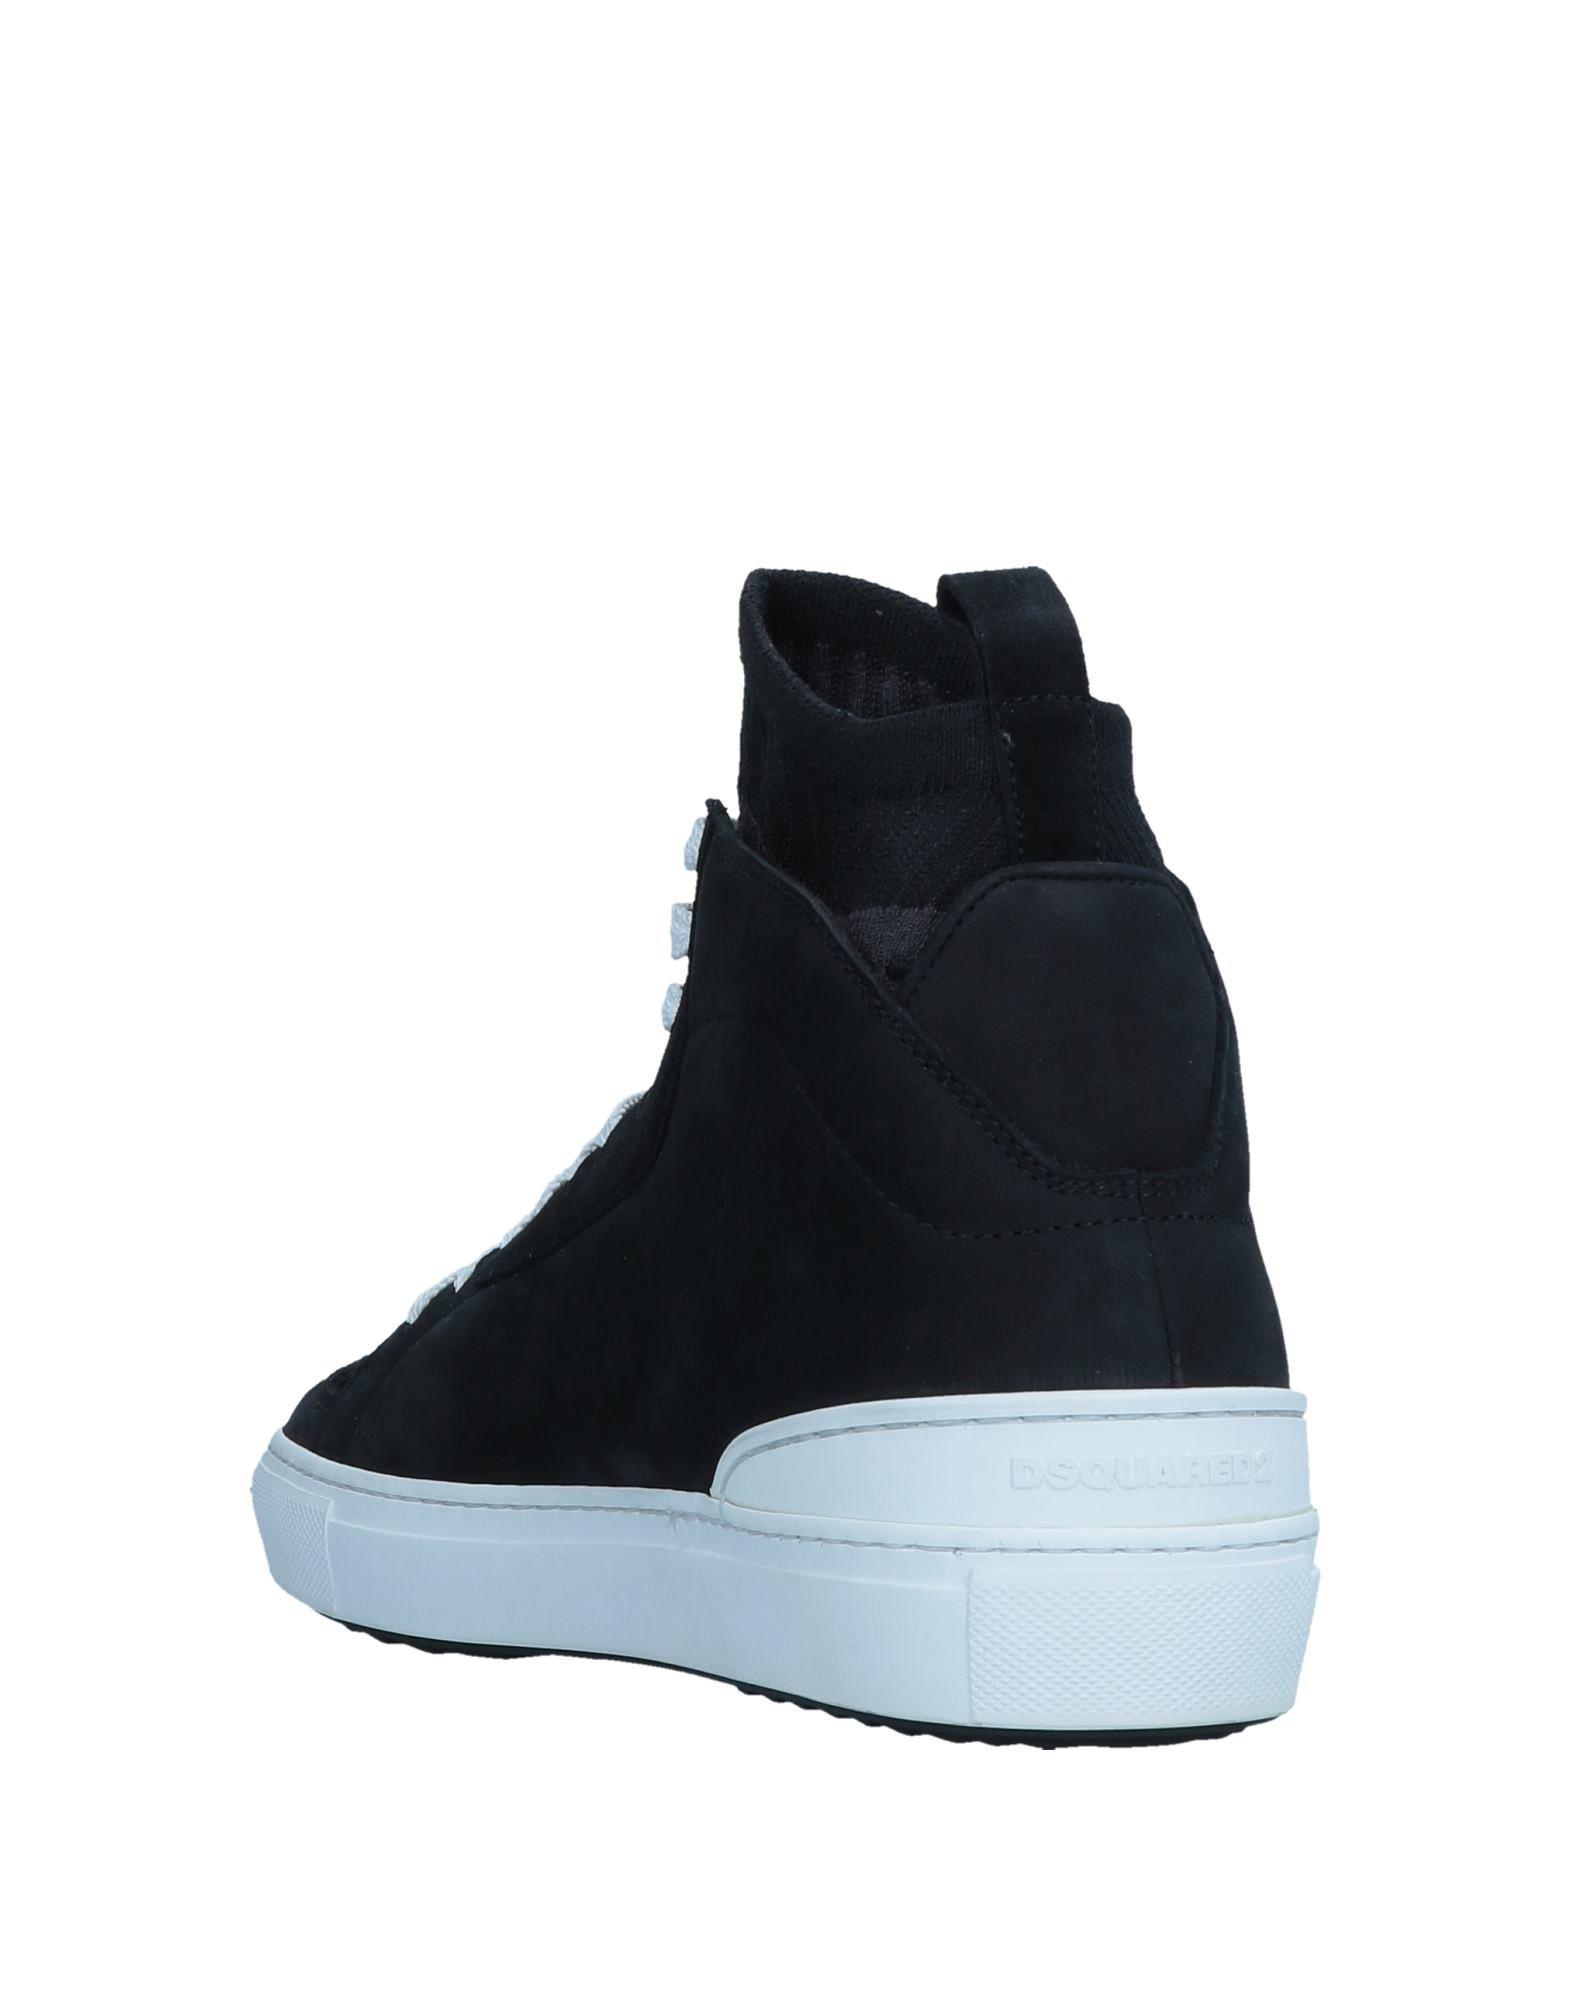 Dsquared2 Sneakers Herren  beliebte 11552677FT Gute Qualität beliebte  Schuhe f67703